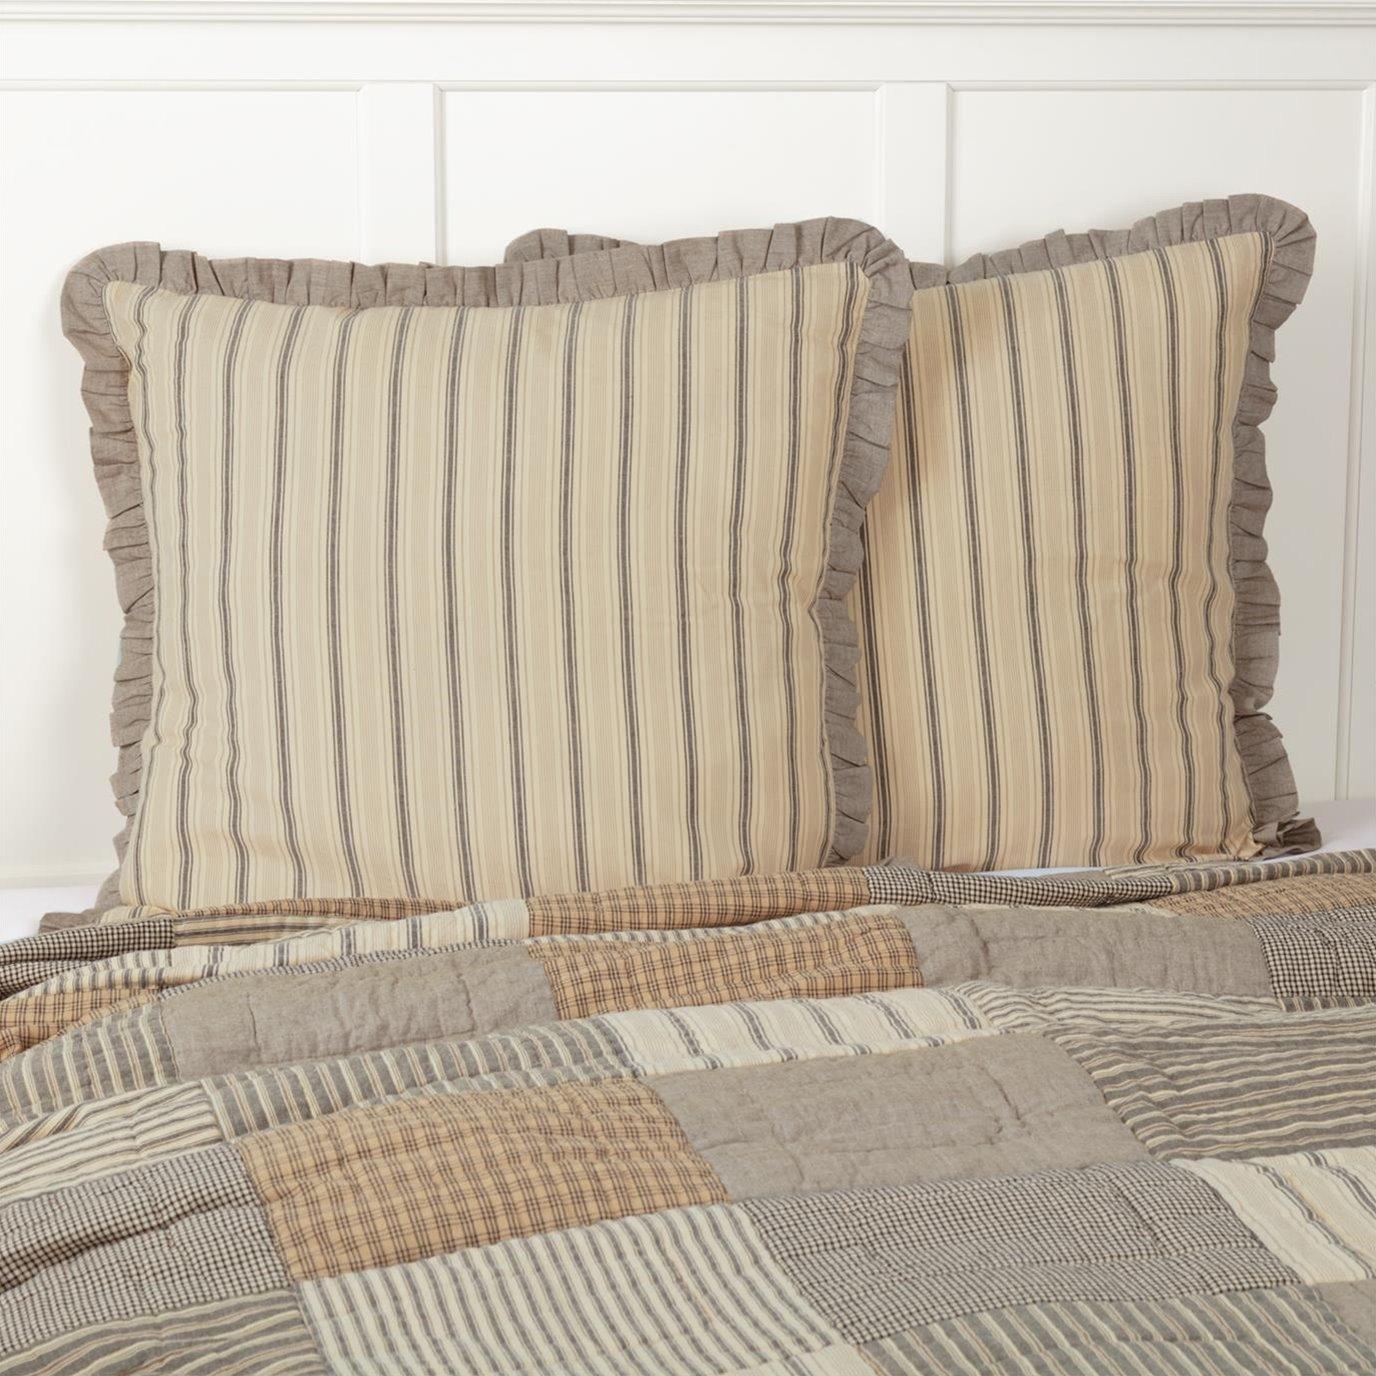 Sawyer Mill Charcoal Fabric Euro Sham 26x26